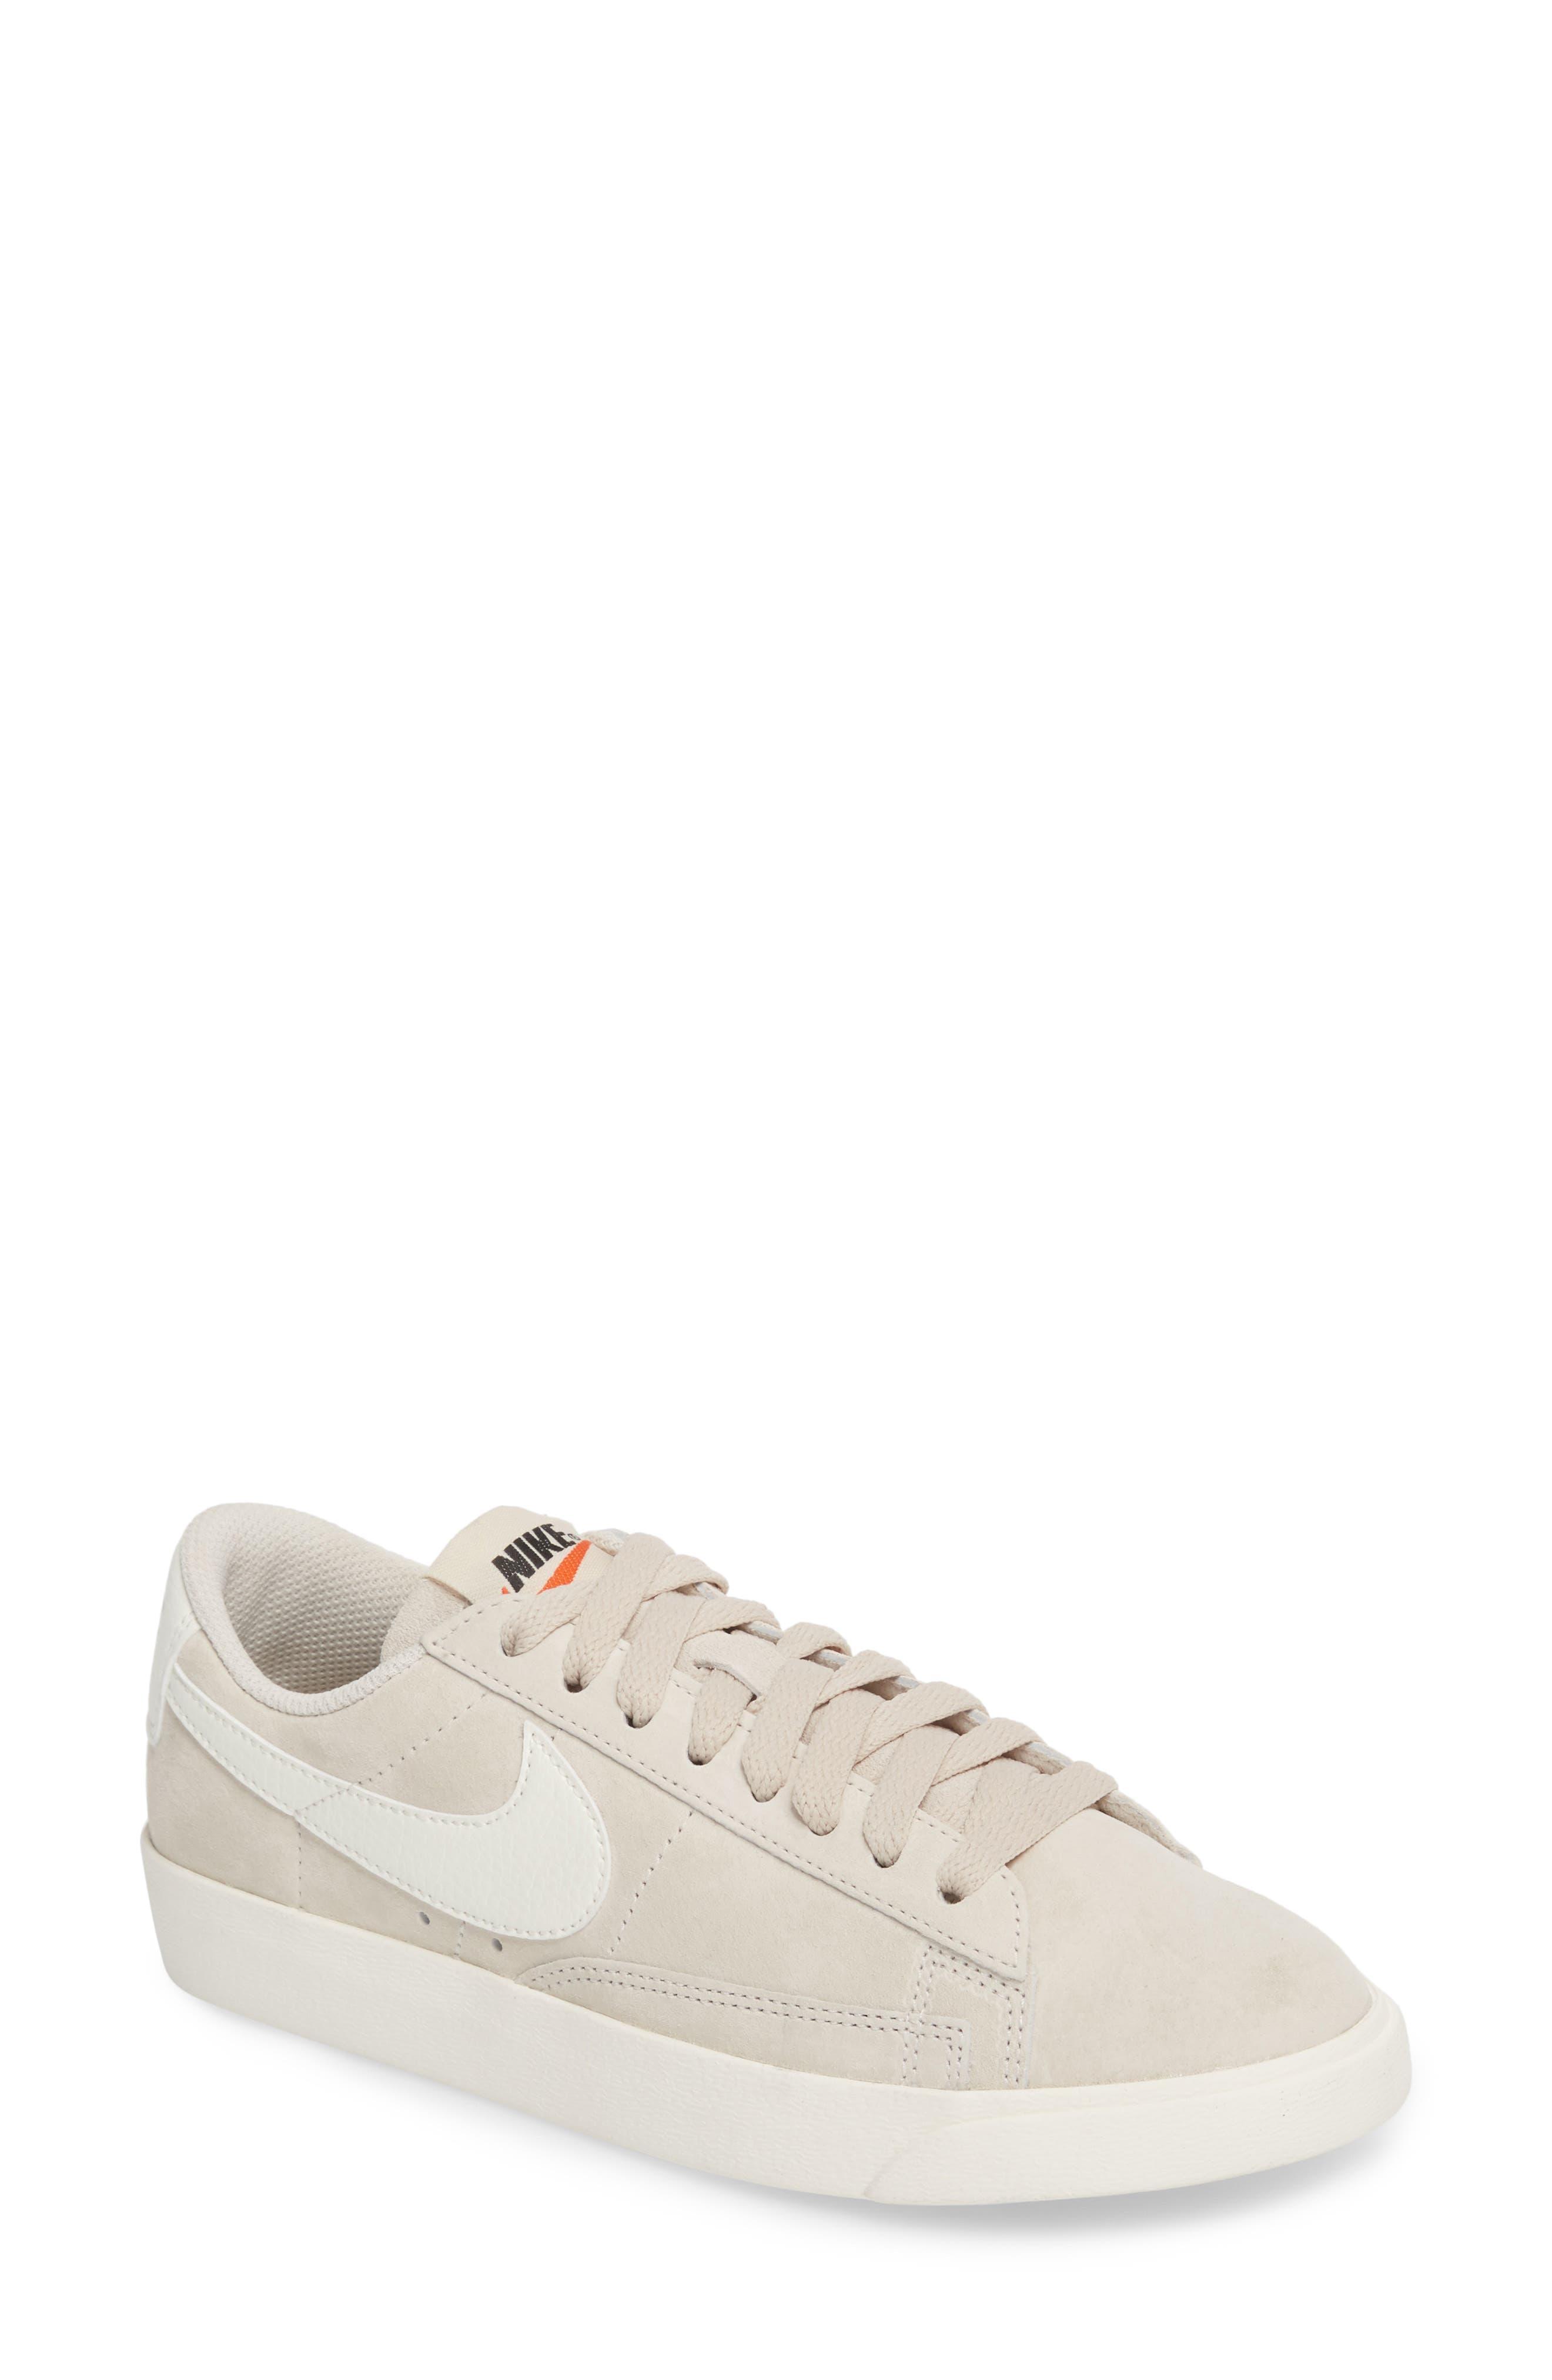 Blazer Low Sneaker,                         Main,                         color,